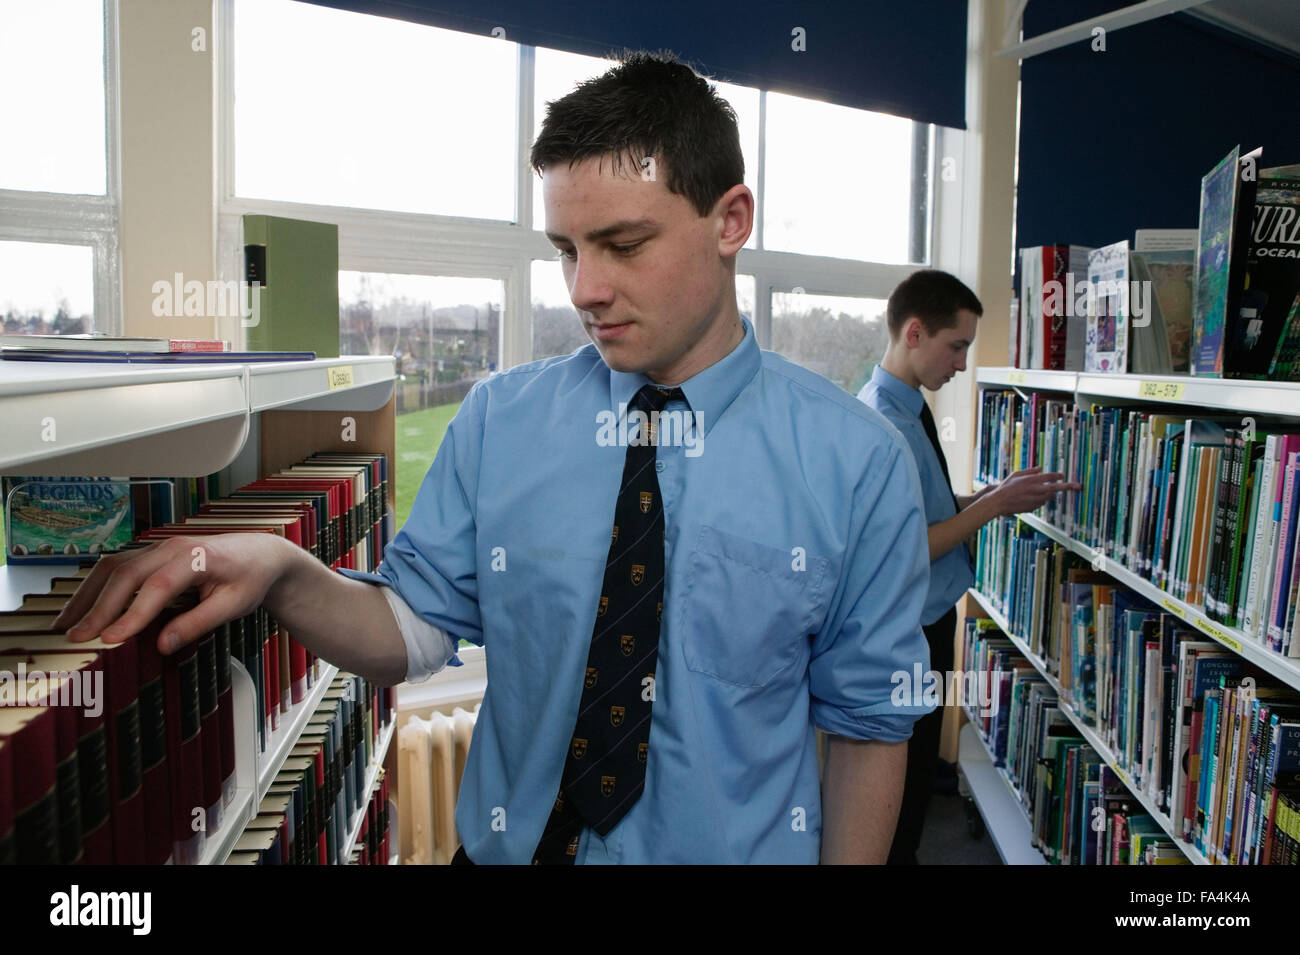 Secondary School Students Stock Photos Amp Secondary School